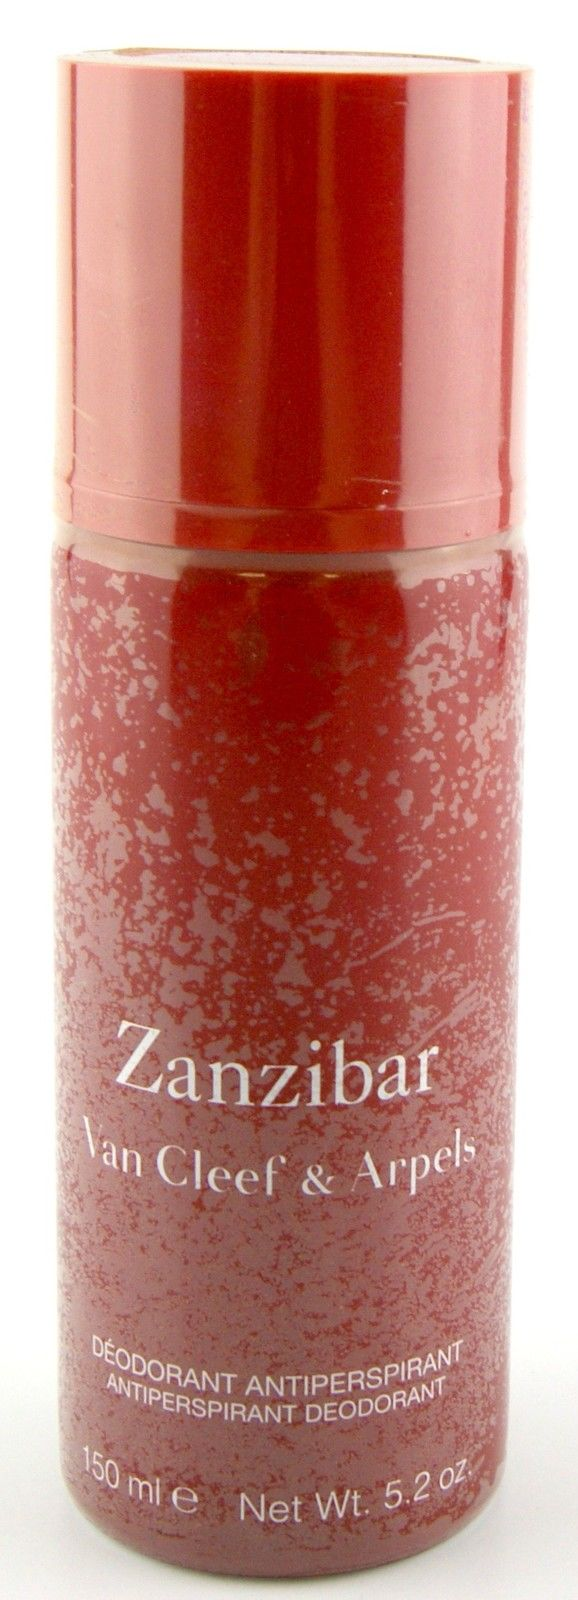 Van Cleef & Arpels Zanzibar Deodorant Spray 150 ml